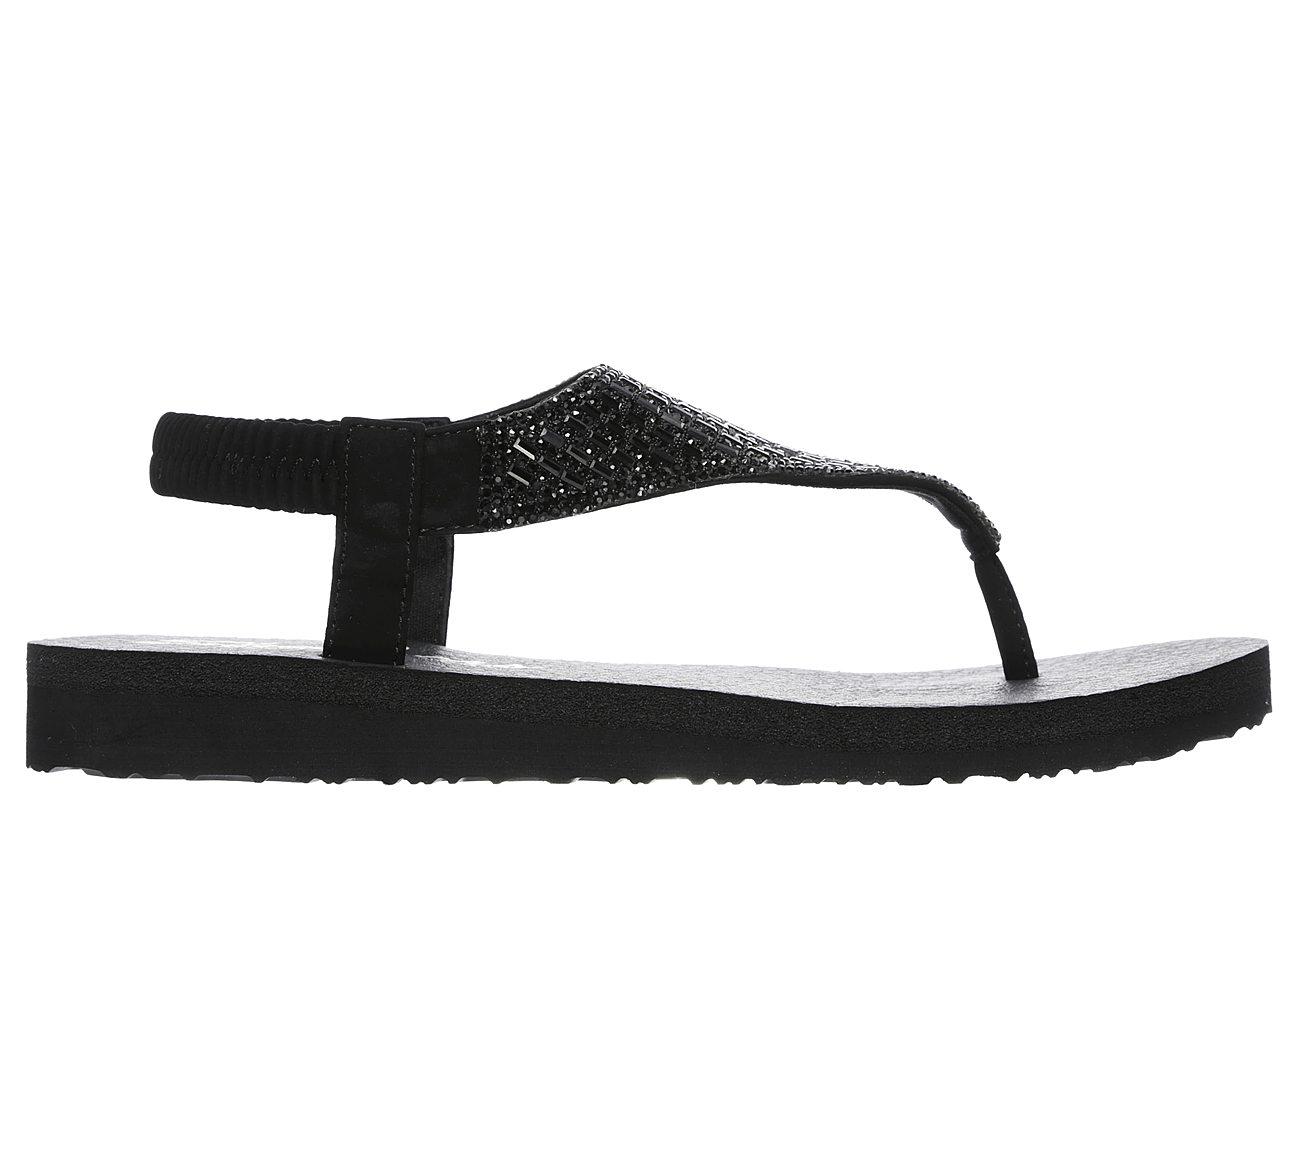 SKECHERS Meditation - Rock Crown Cali Shoes